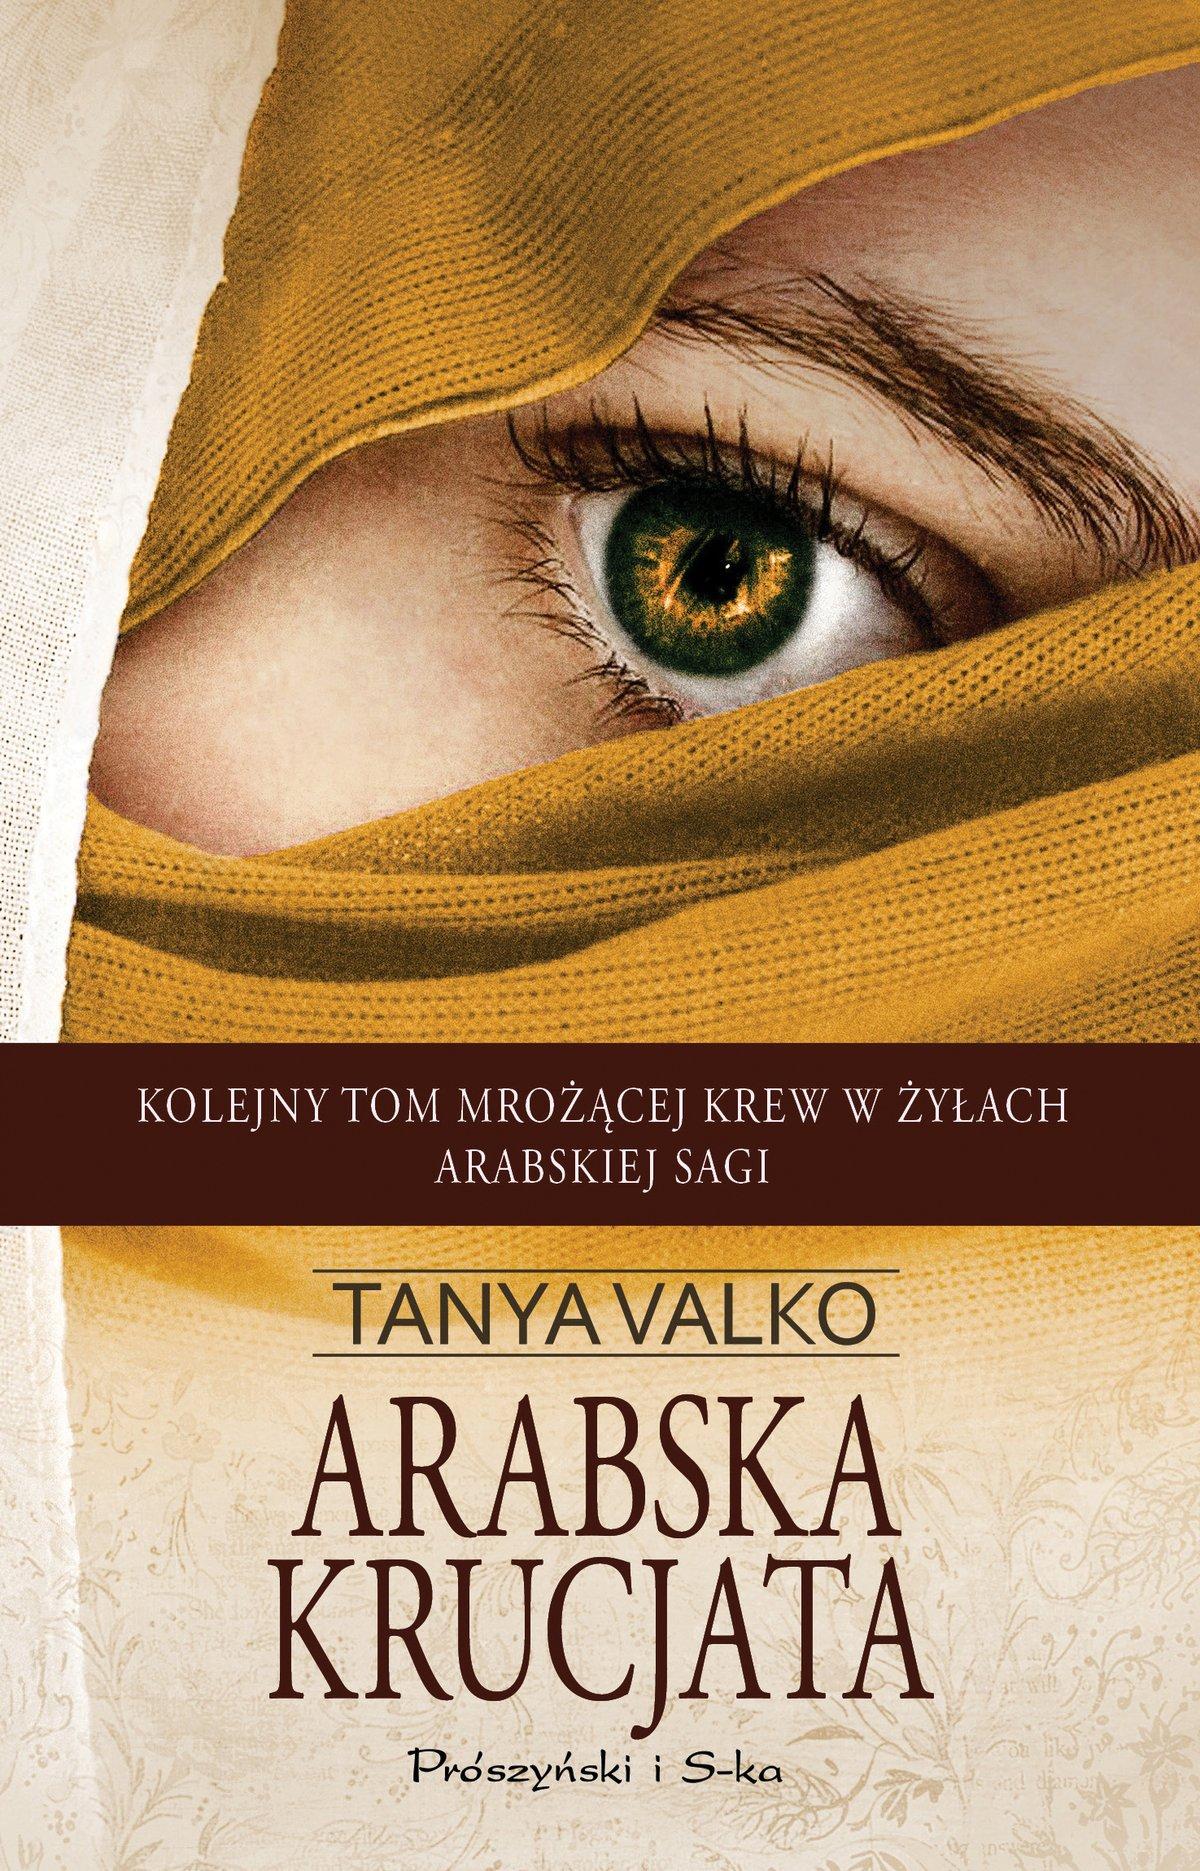 Arabska krucjata - Ebook (Książka na Kindle) do pobrania w formacie MOBI